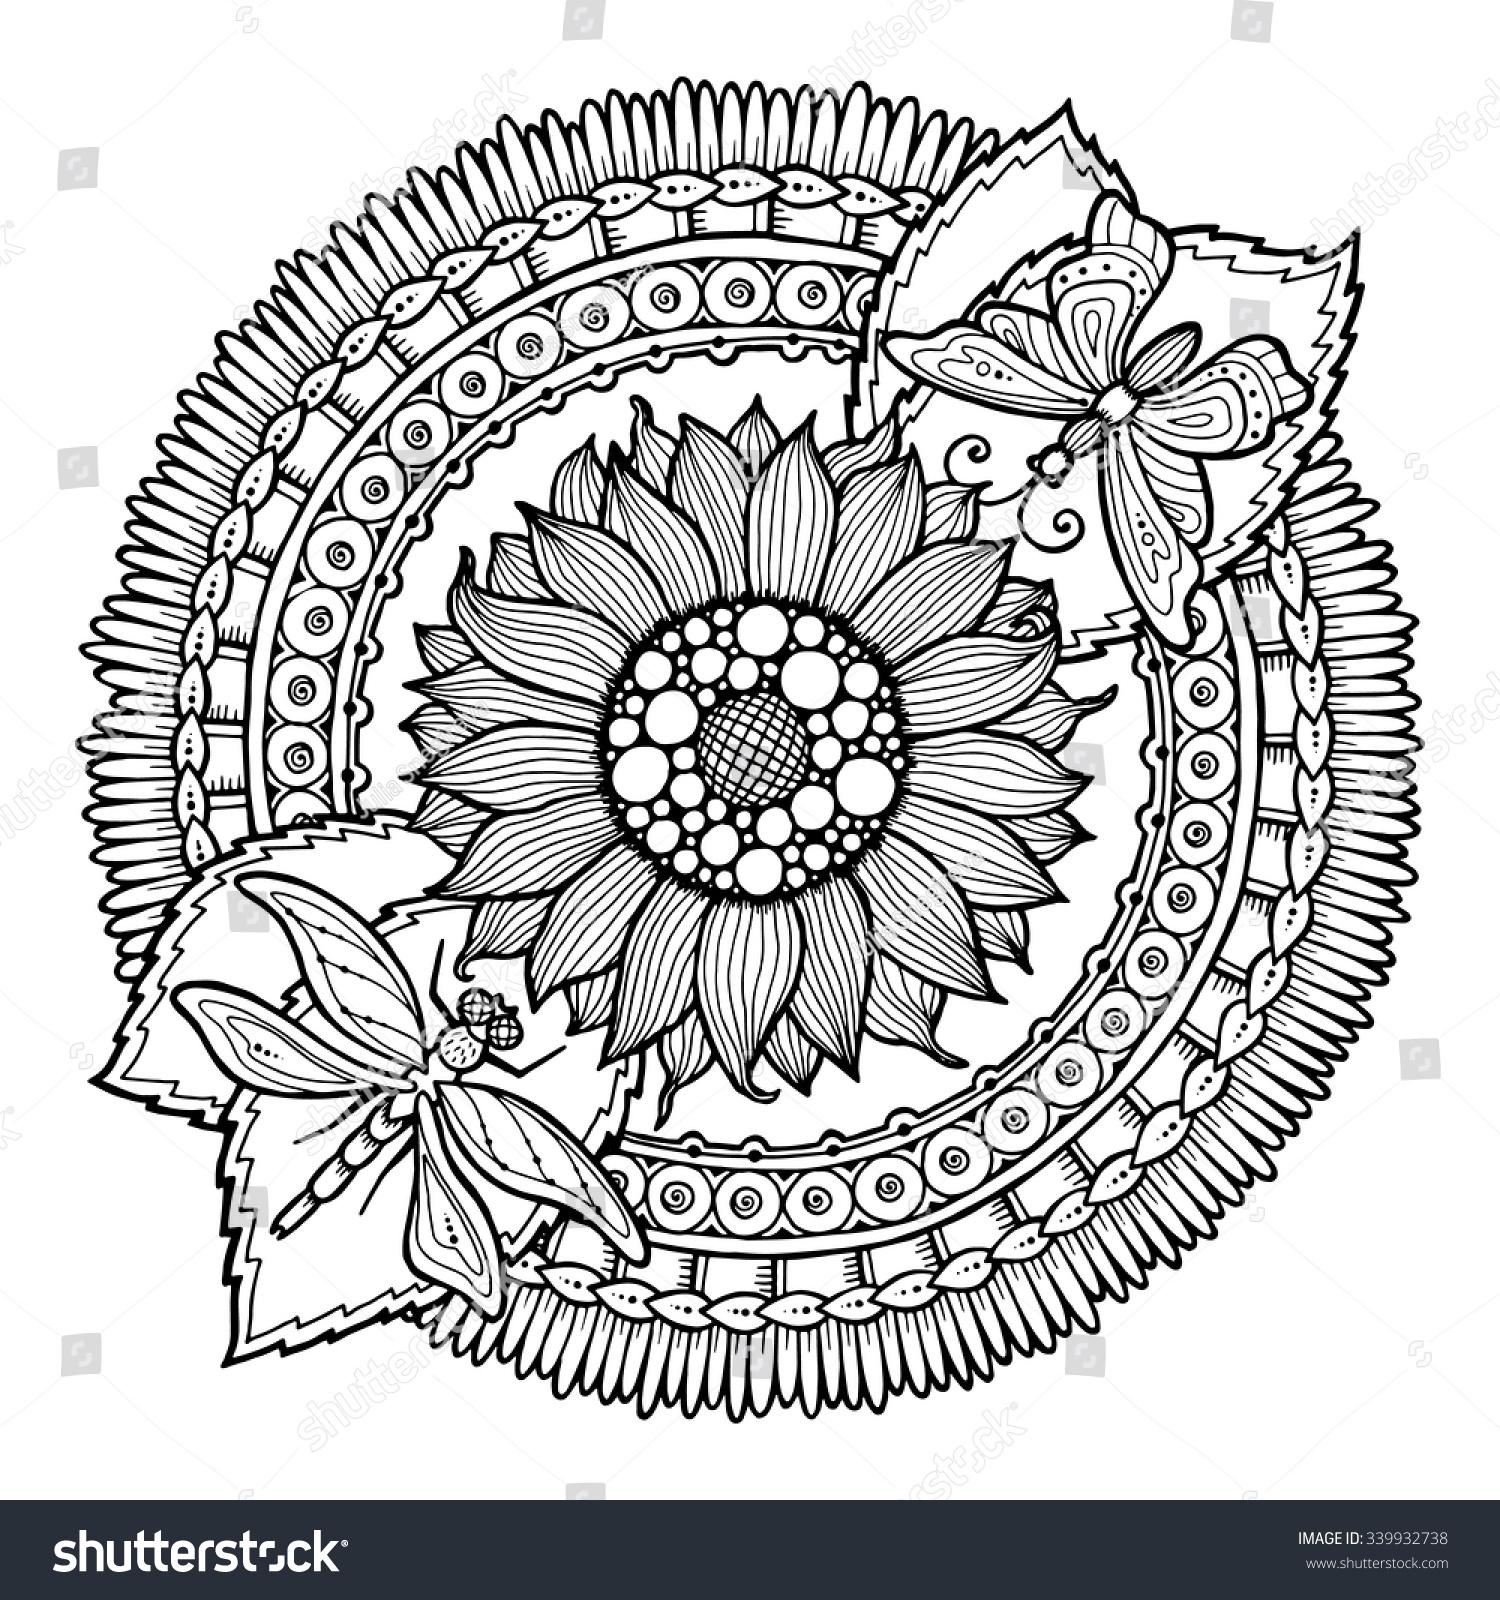 Circle Summer Doodle Flower Ornament Hand Drawn Art